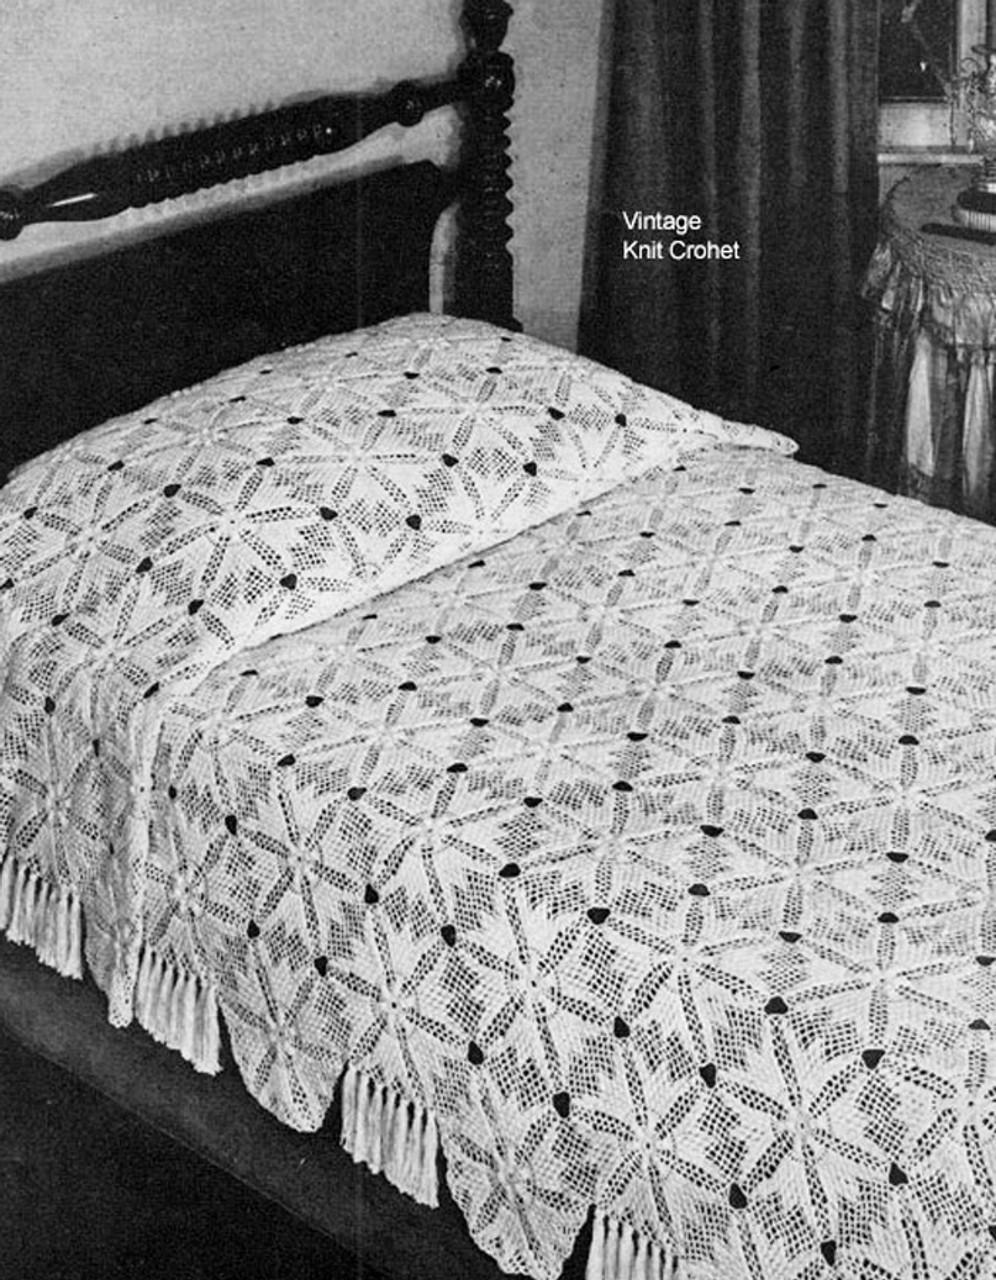 Crochet Chevy Chase Bedspread pattern